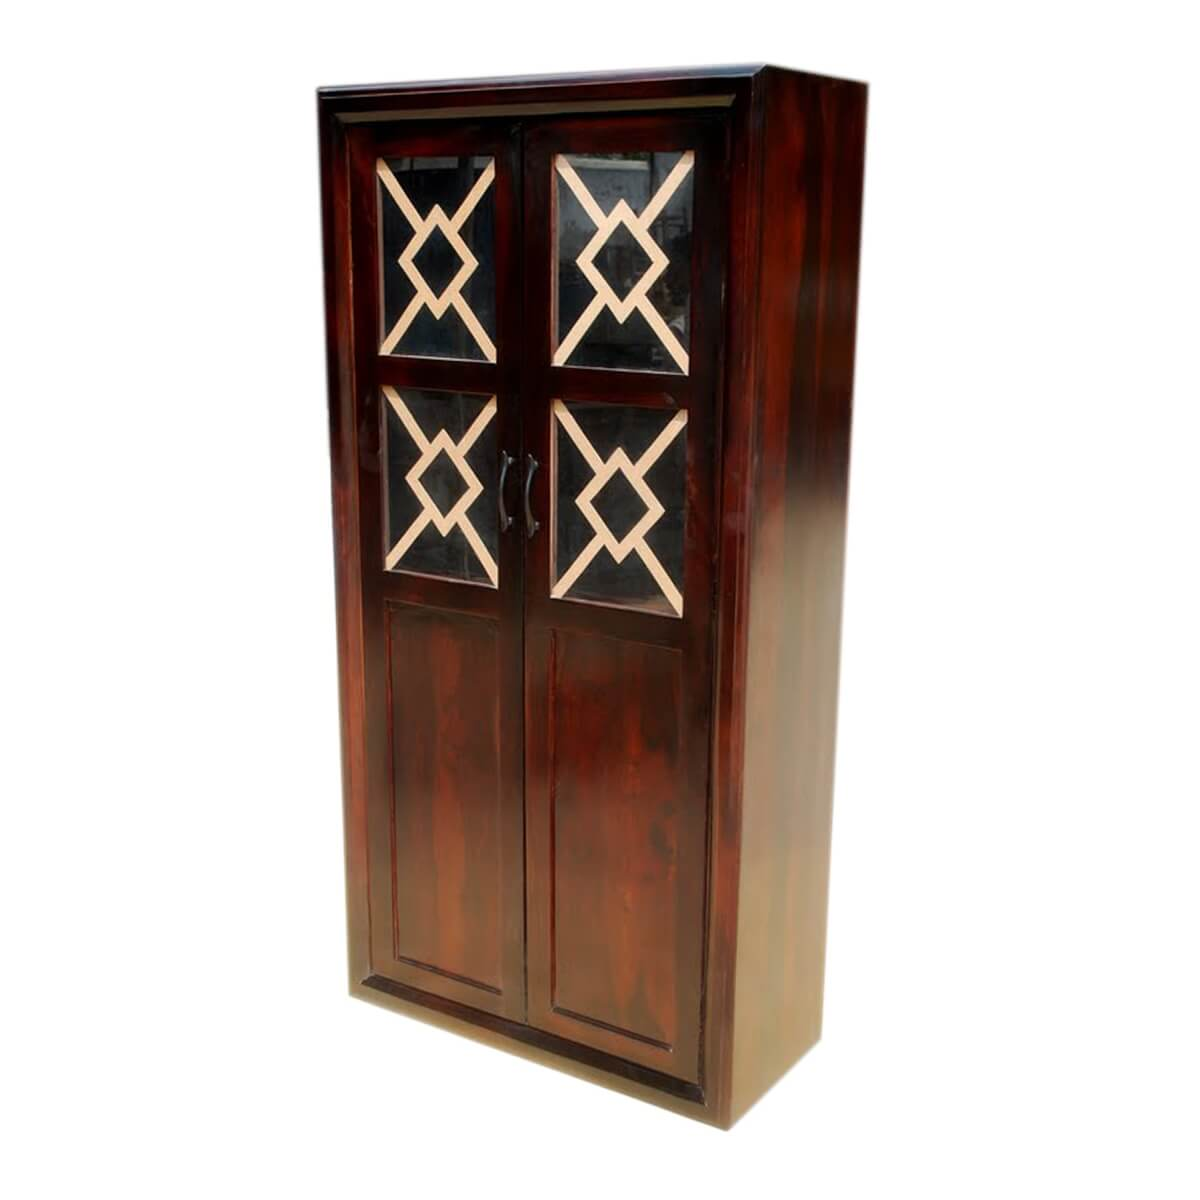 solid wood glass doors armoire wardrobe furniture. Black Bedroom Furniture Sets. Home Design Ideas